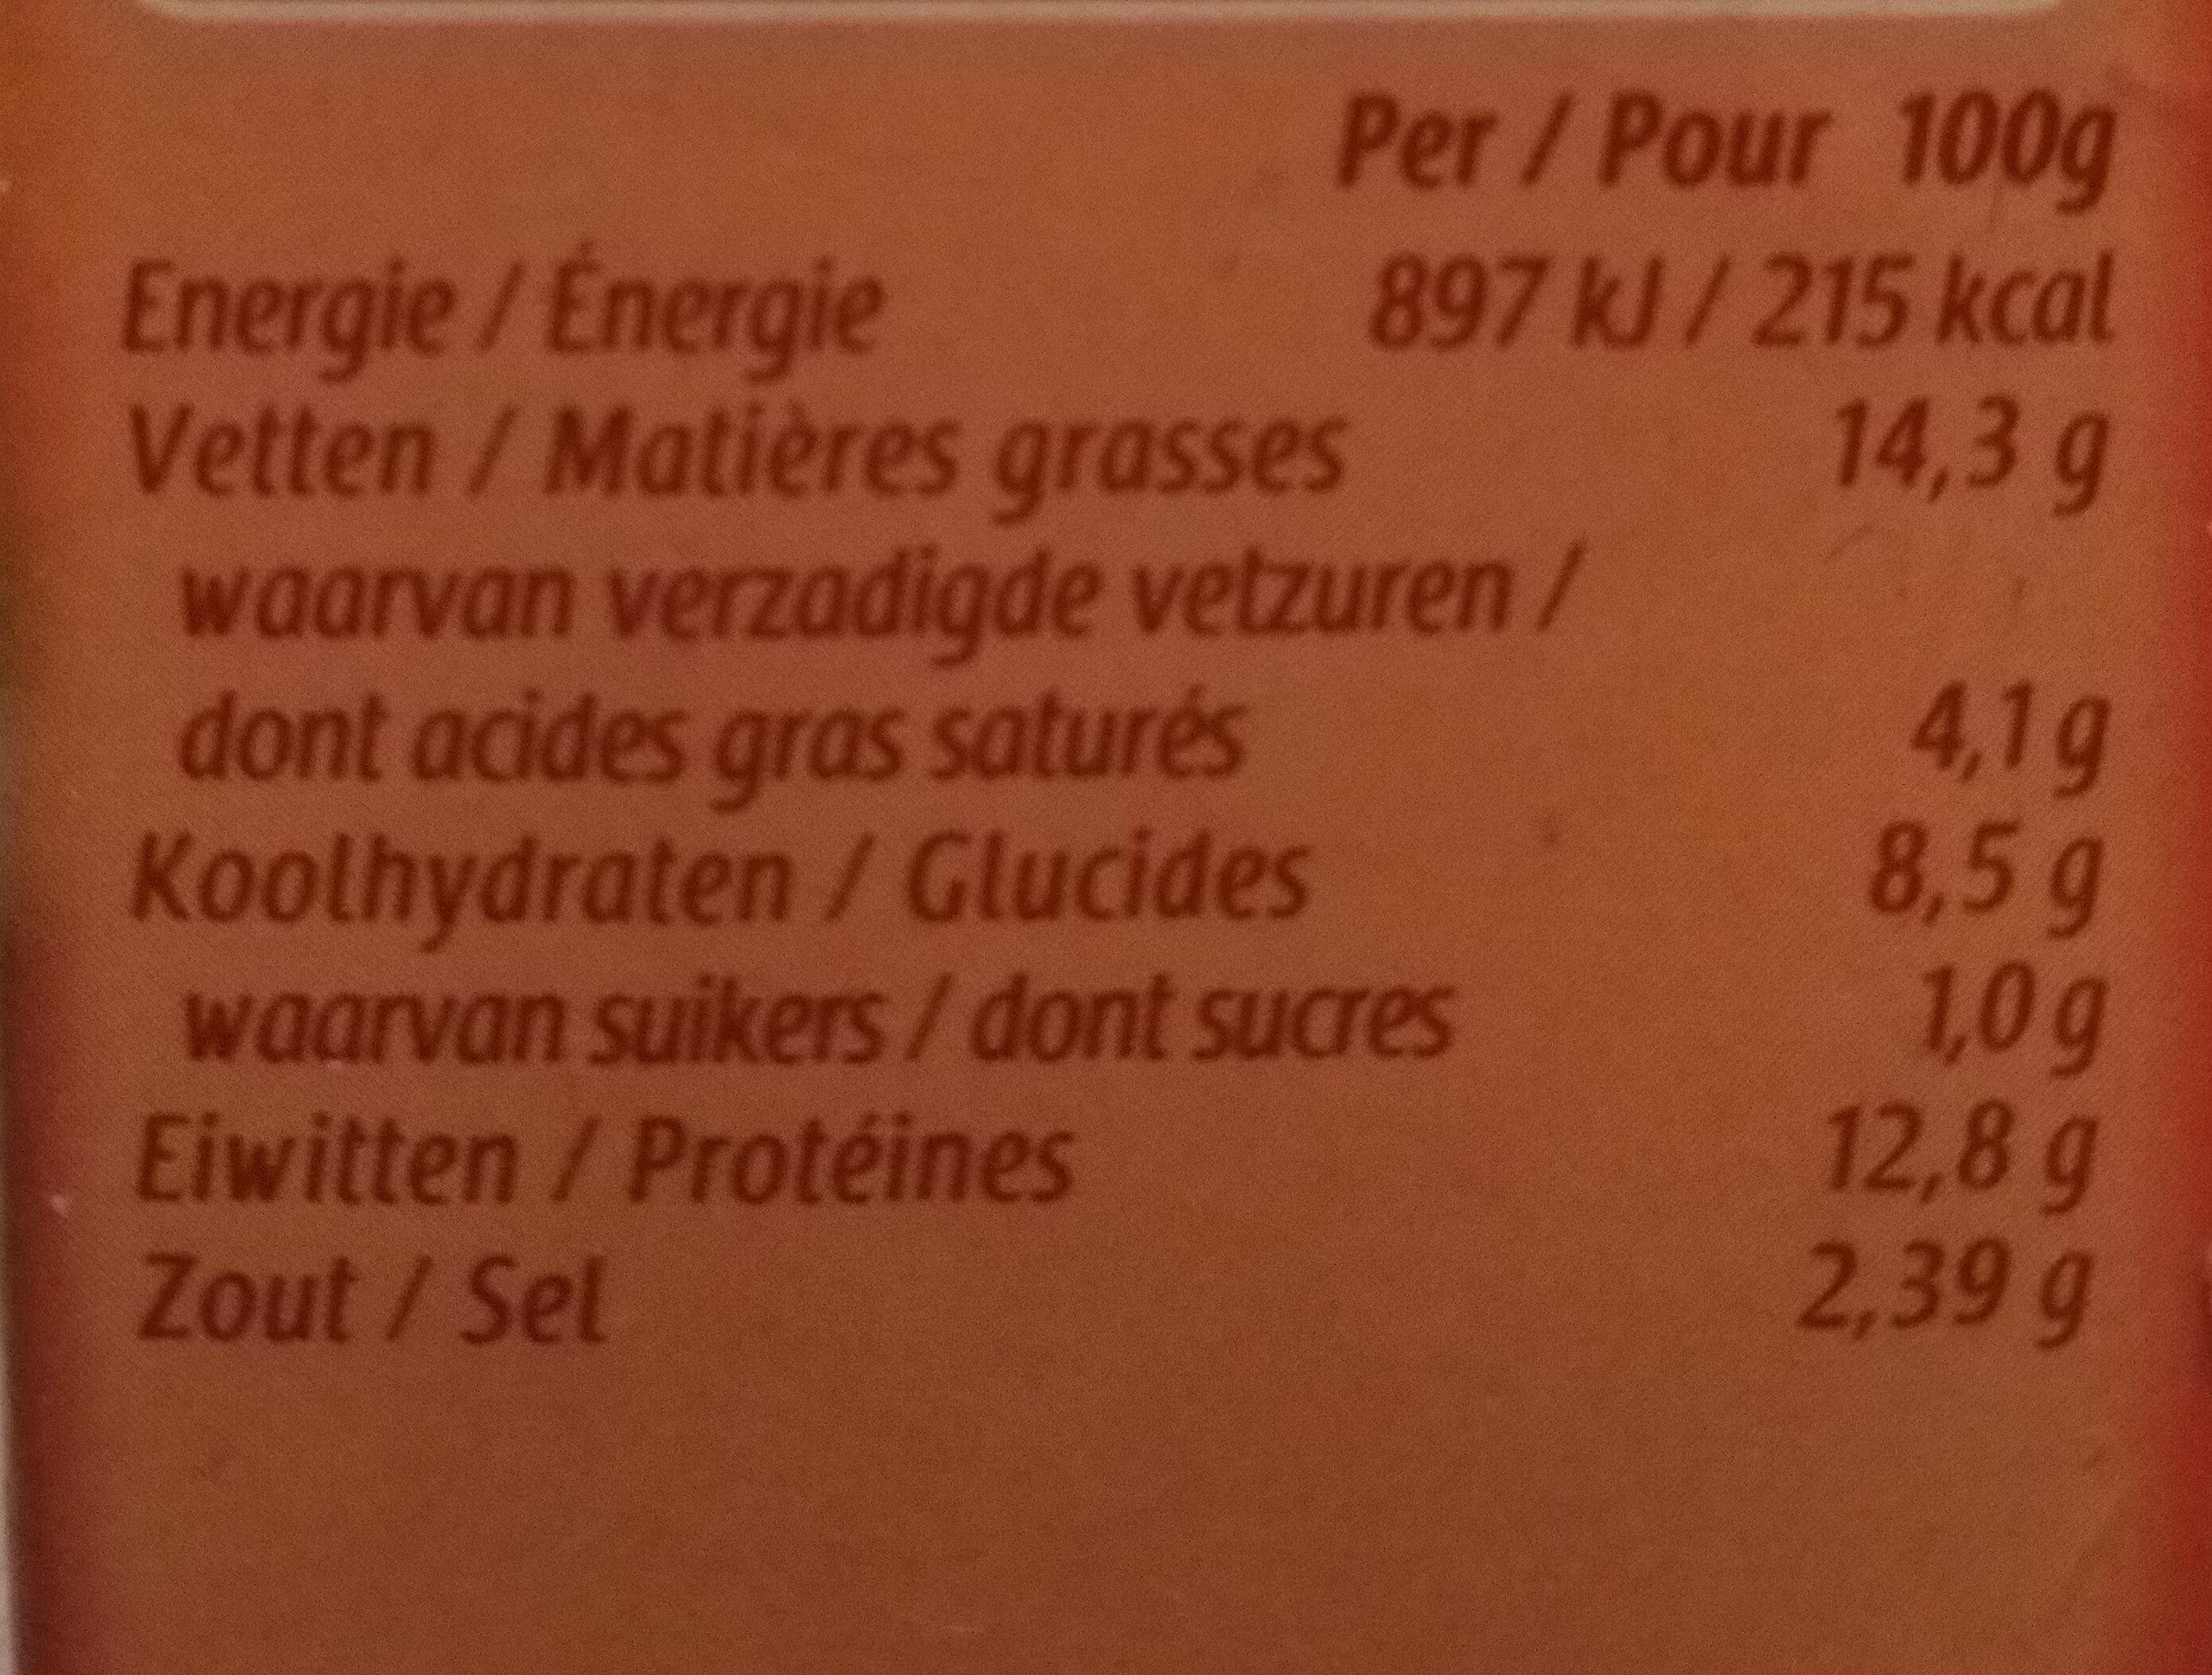 Frikandellen - Informations nutritionnelles